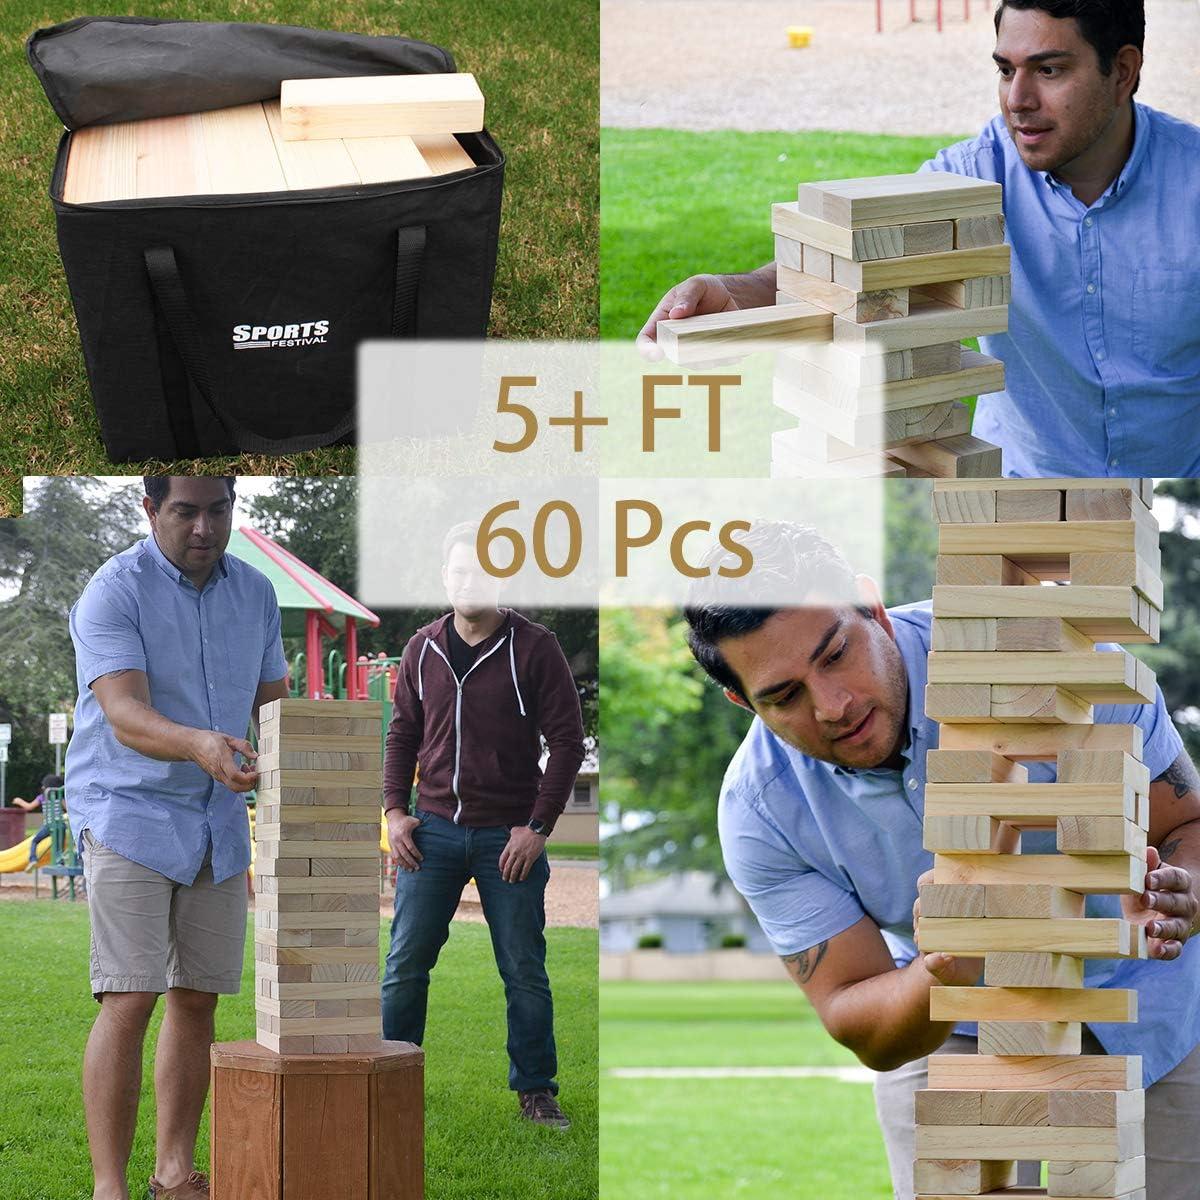 60Pcs Large Wooden Blocks for Adults with Storage Bag Stacks to 5+ Feet LOKATSE HOME Jumbo Giant Jenga Yard Games Tumble Tower Outdoor Toys